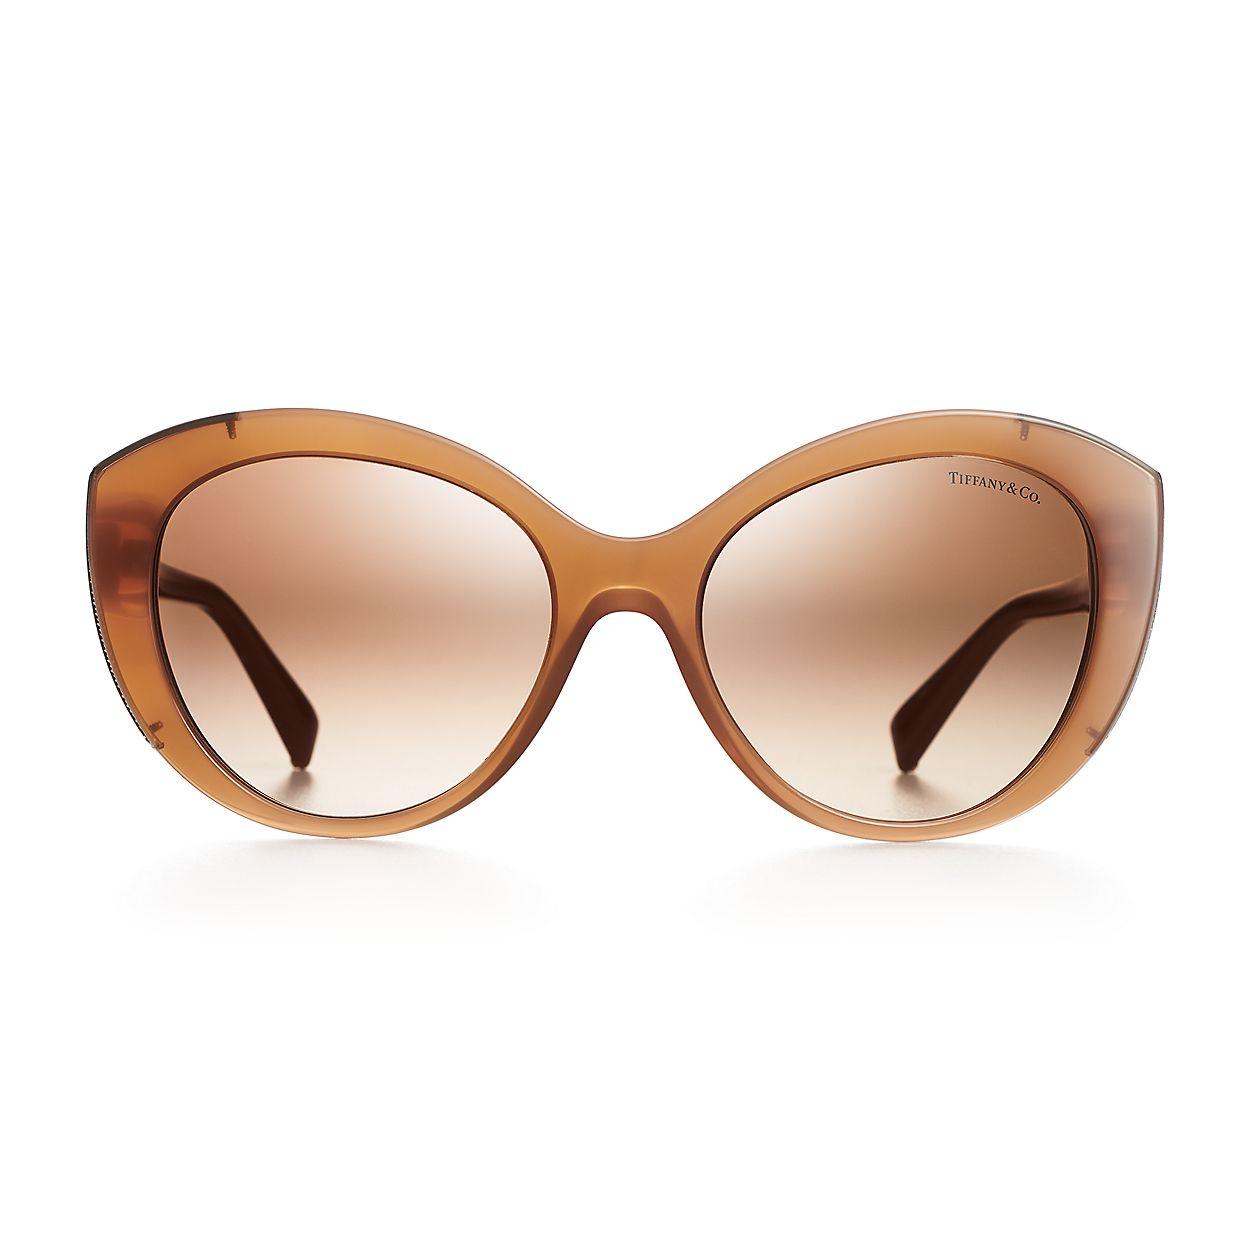 62c20b65e84e Diamond Point cat eye sunglasses in camel acetate and pale gold ...